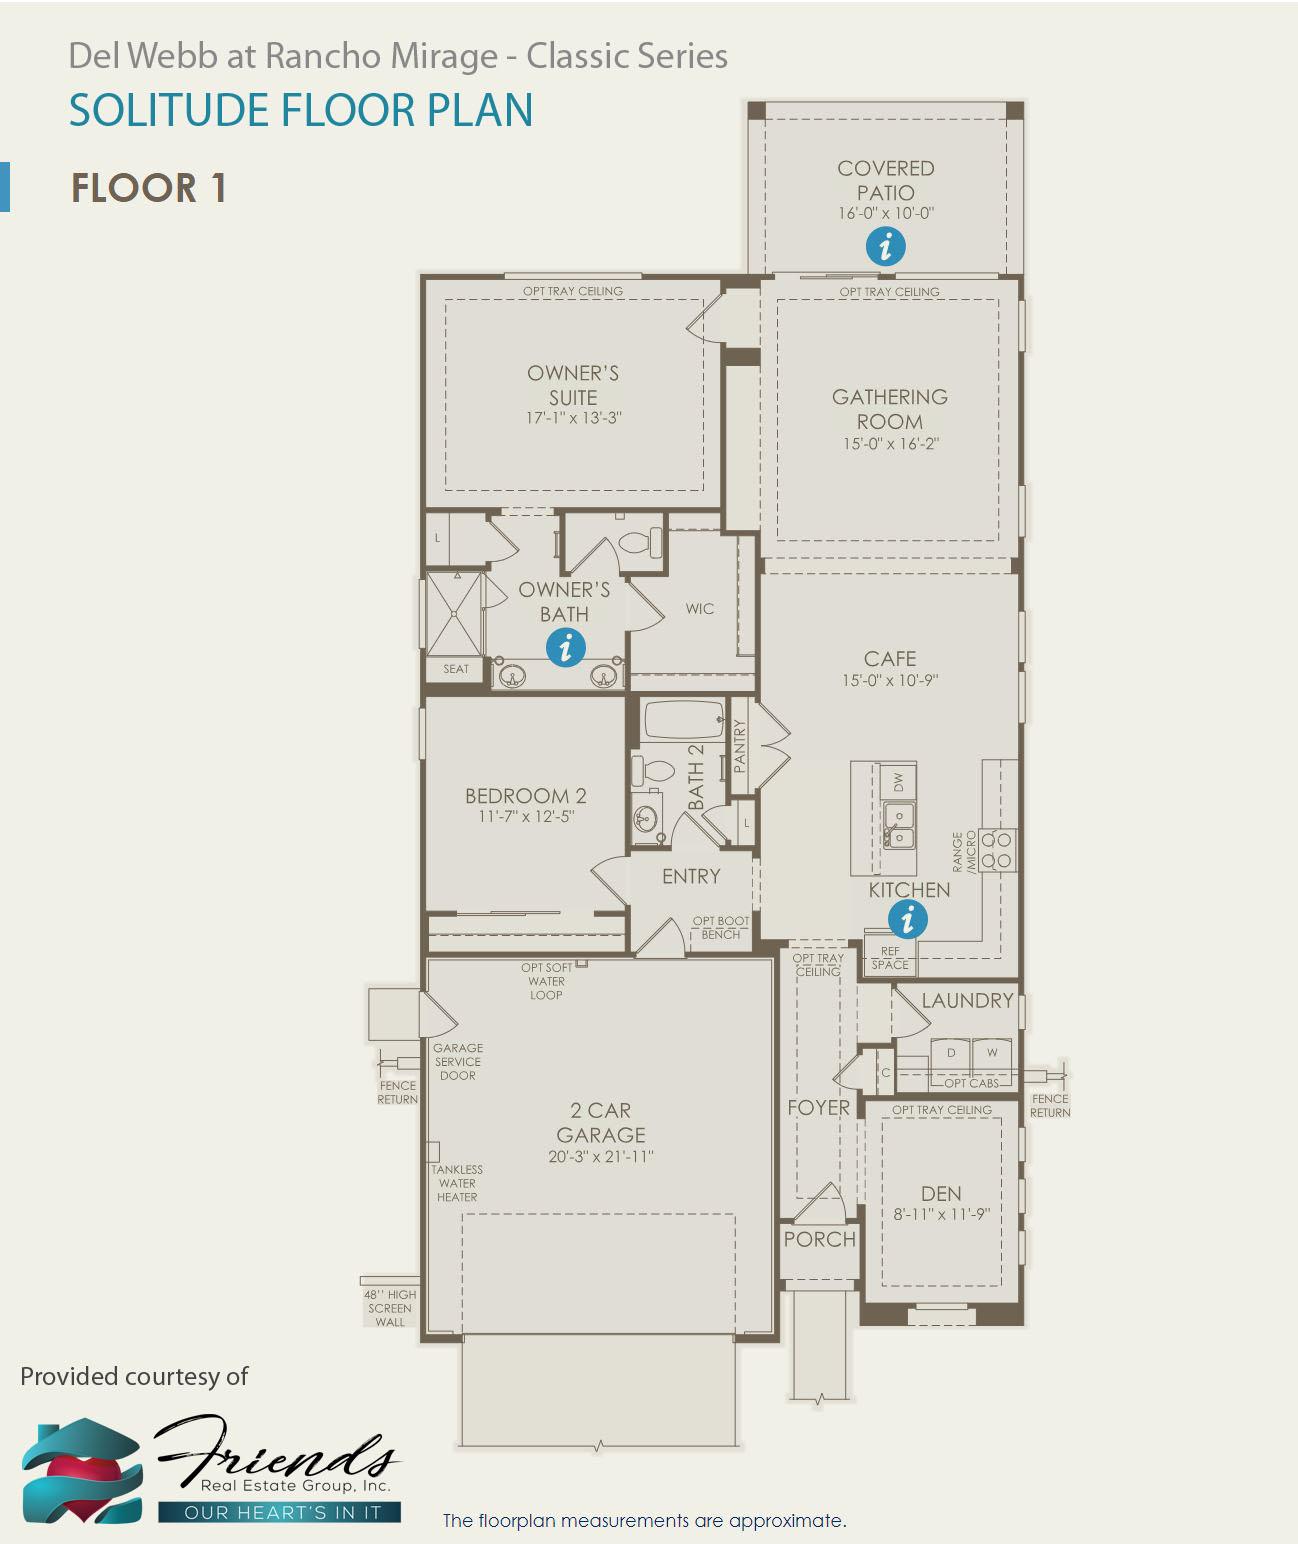 Classic Series ~ Solitude Floor Plan